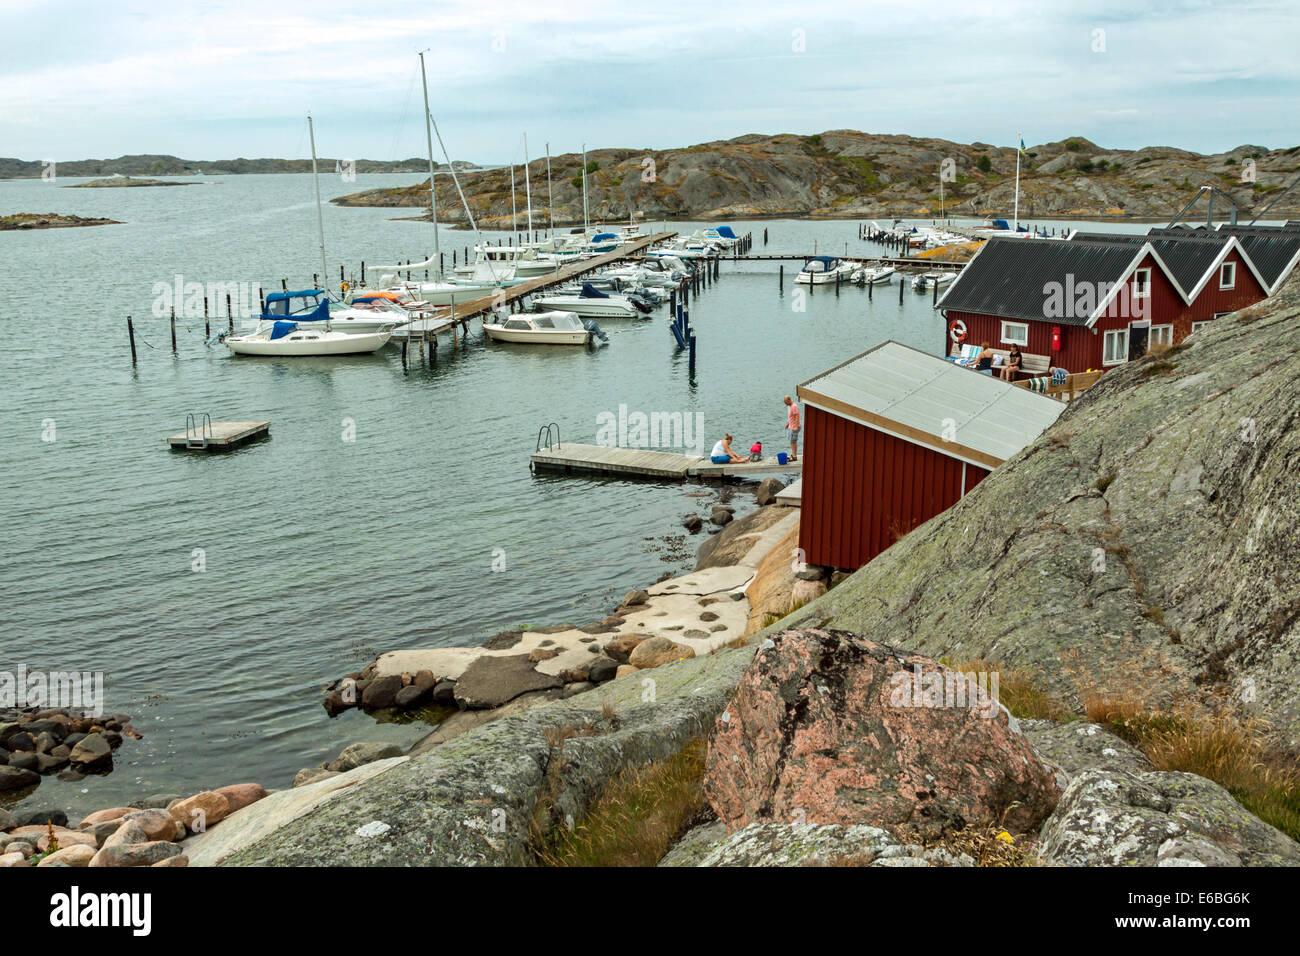 Tjrns BK, Sommartvling VIII - Svenska Bridgefrbundet